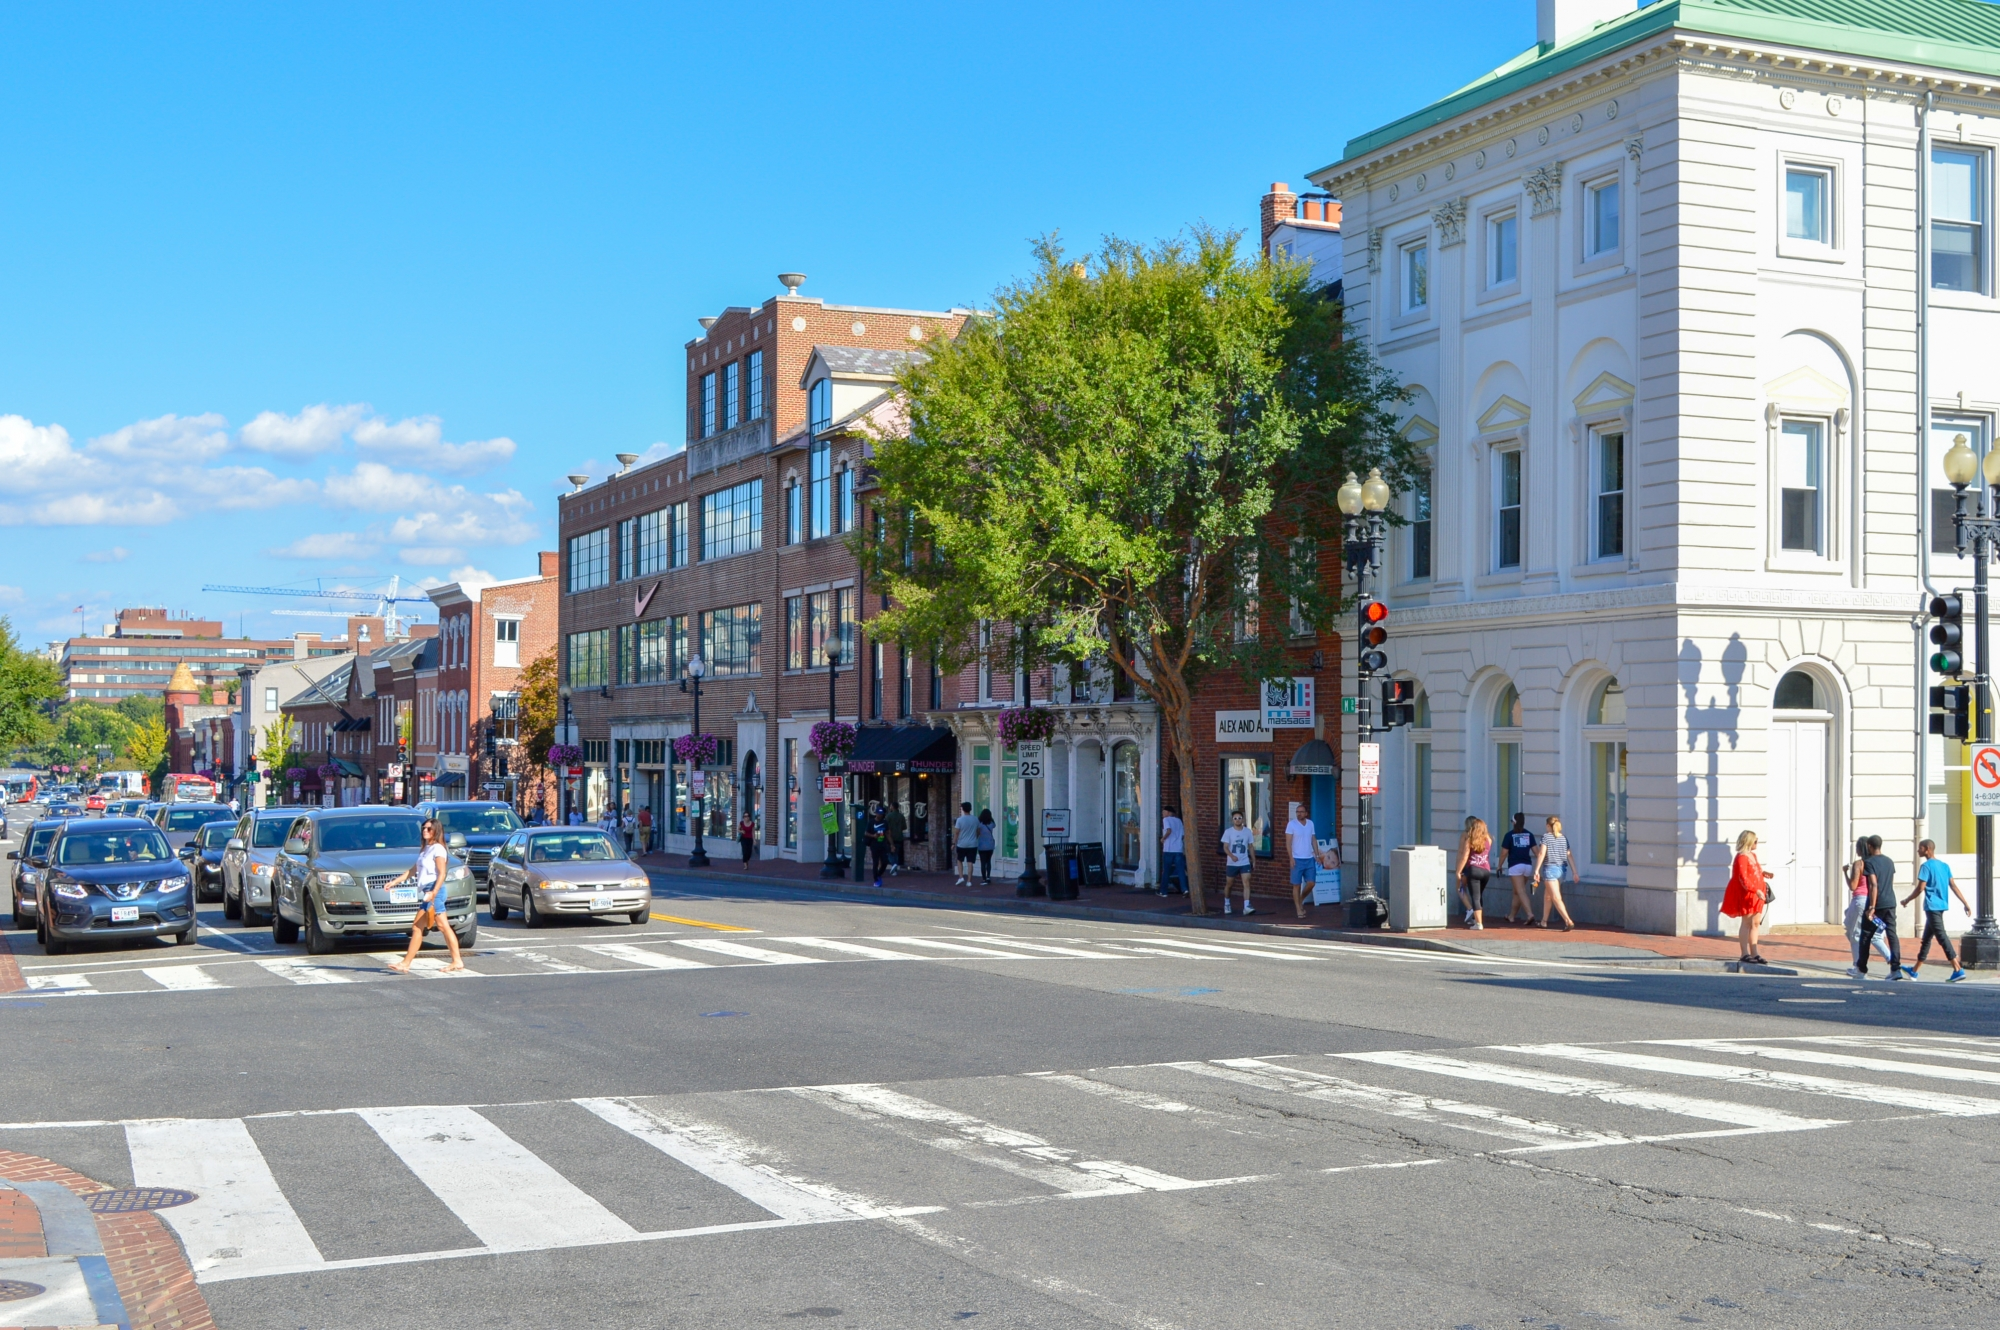 Georgetown Main Street, Washington D.C.